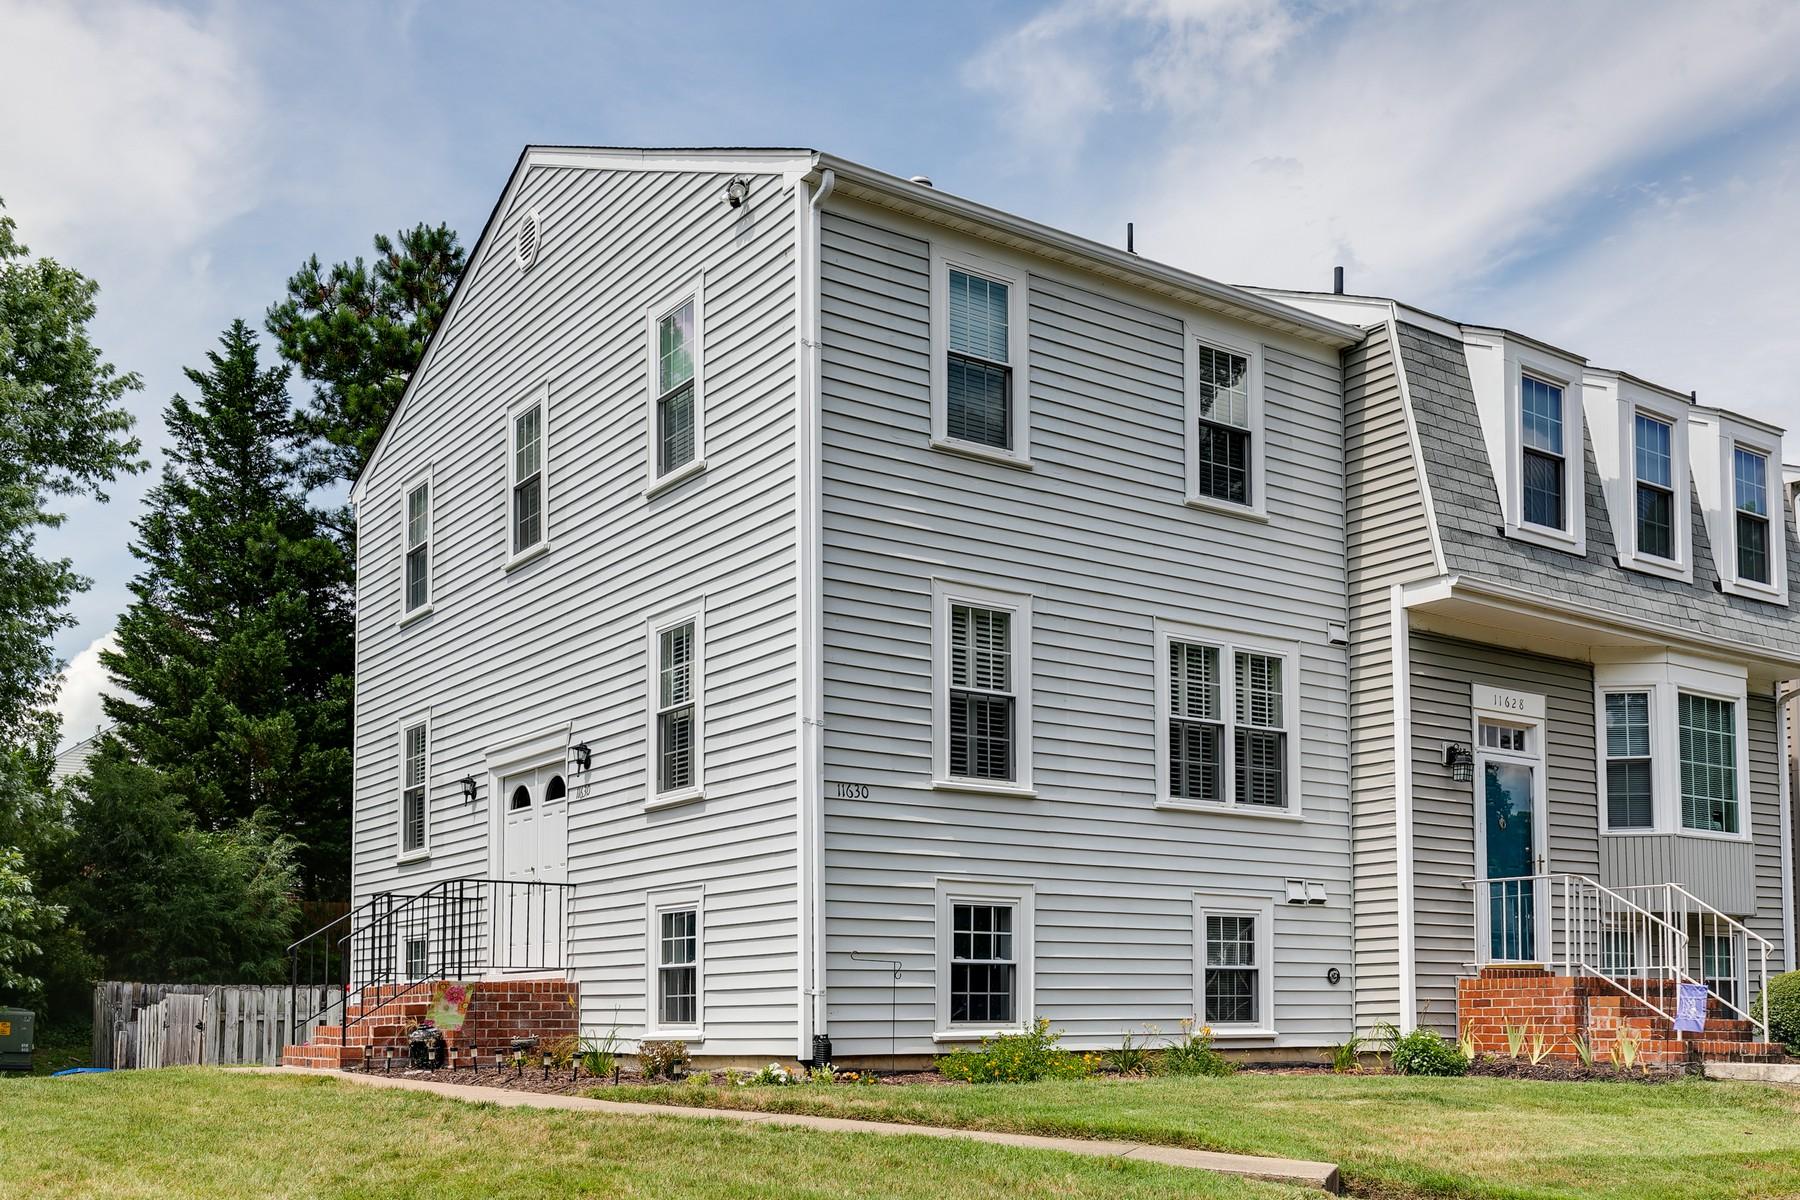 townhouses por un Venta en 11630 Timberly Waye Henrico, Virginia 23238 Estados Unidos